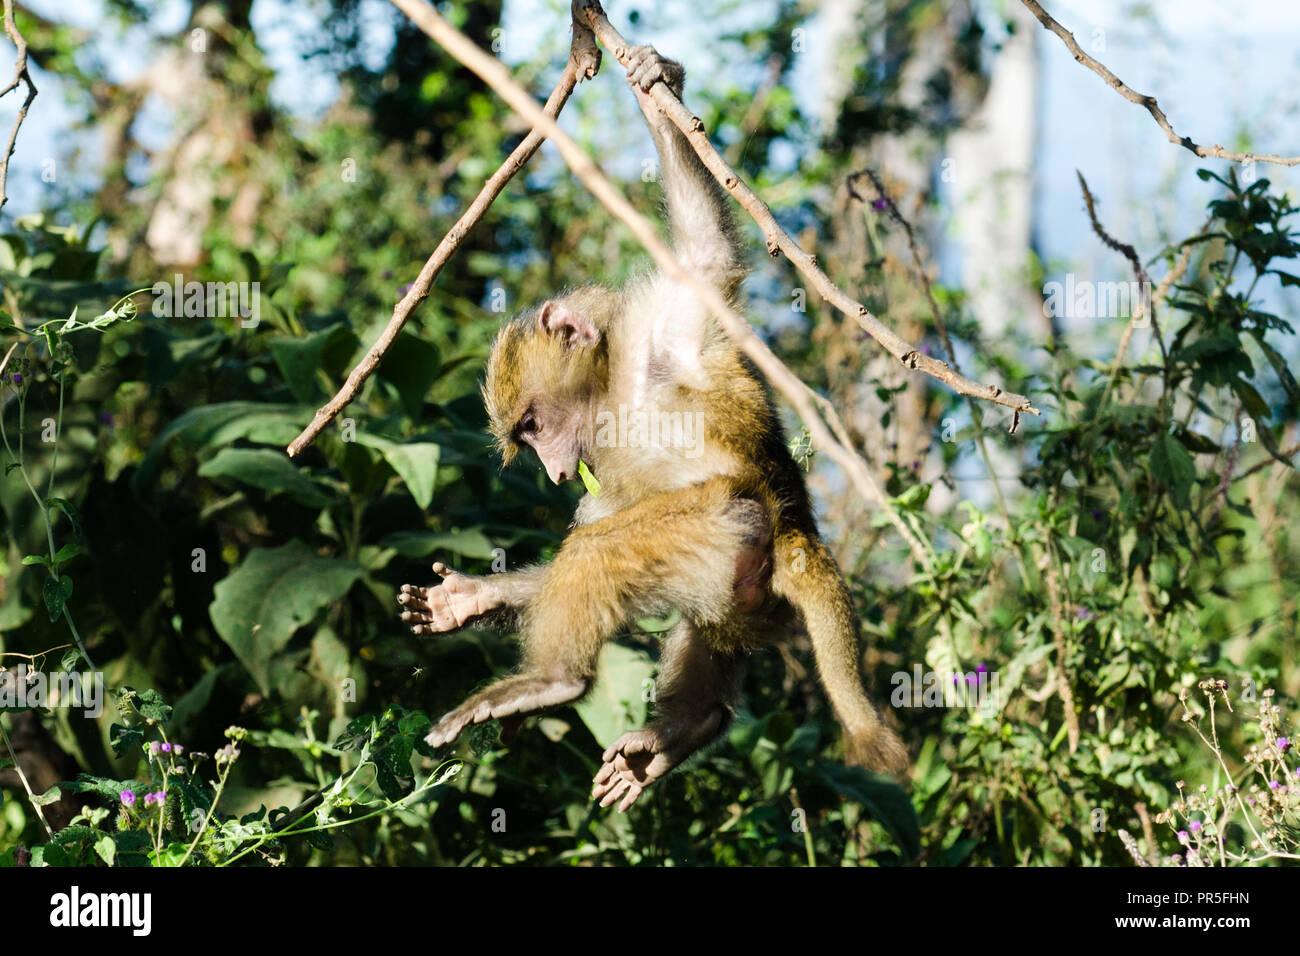 Young olive baboon (Papio Anubis) hanging from tree branches, Lake Nakuru, Kenya - Stock Image